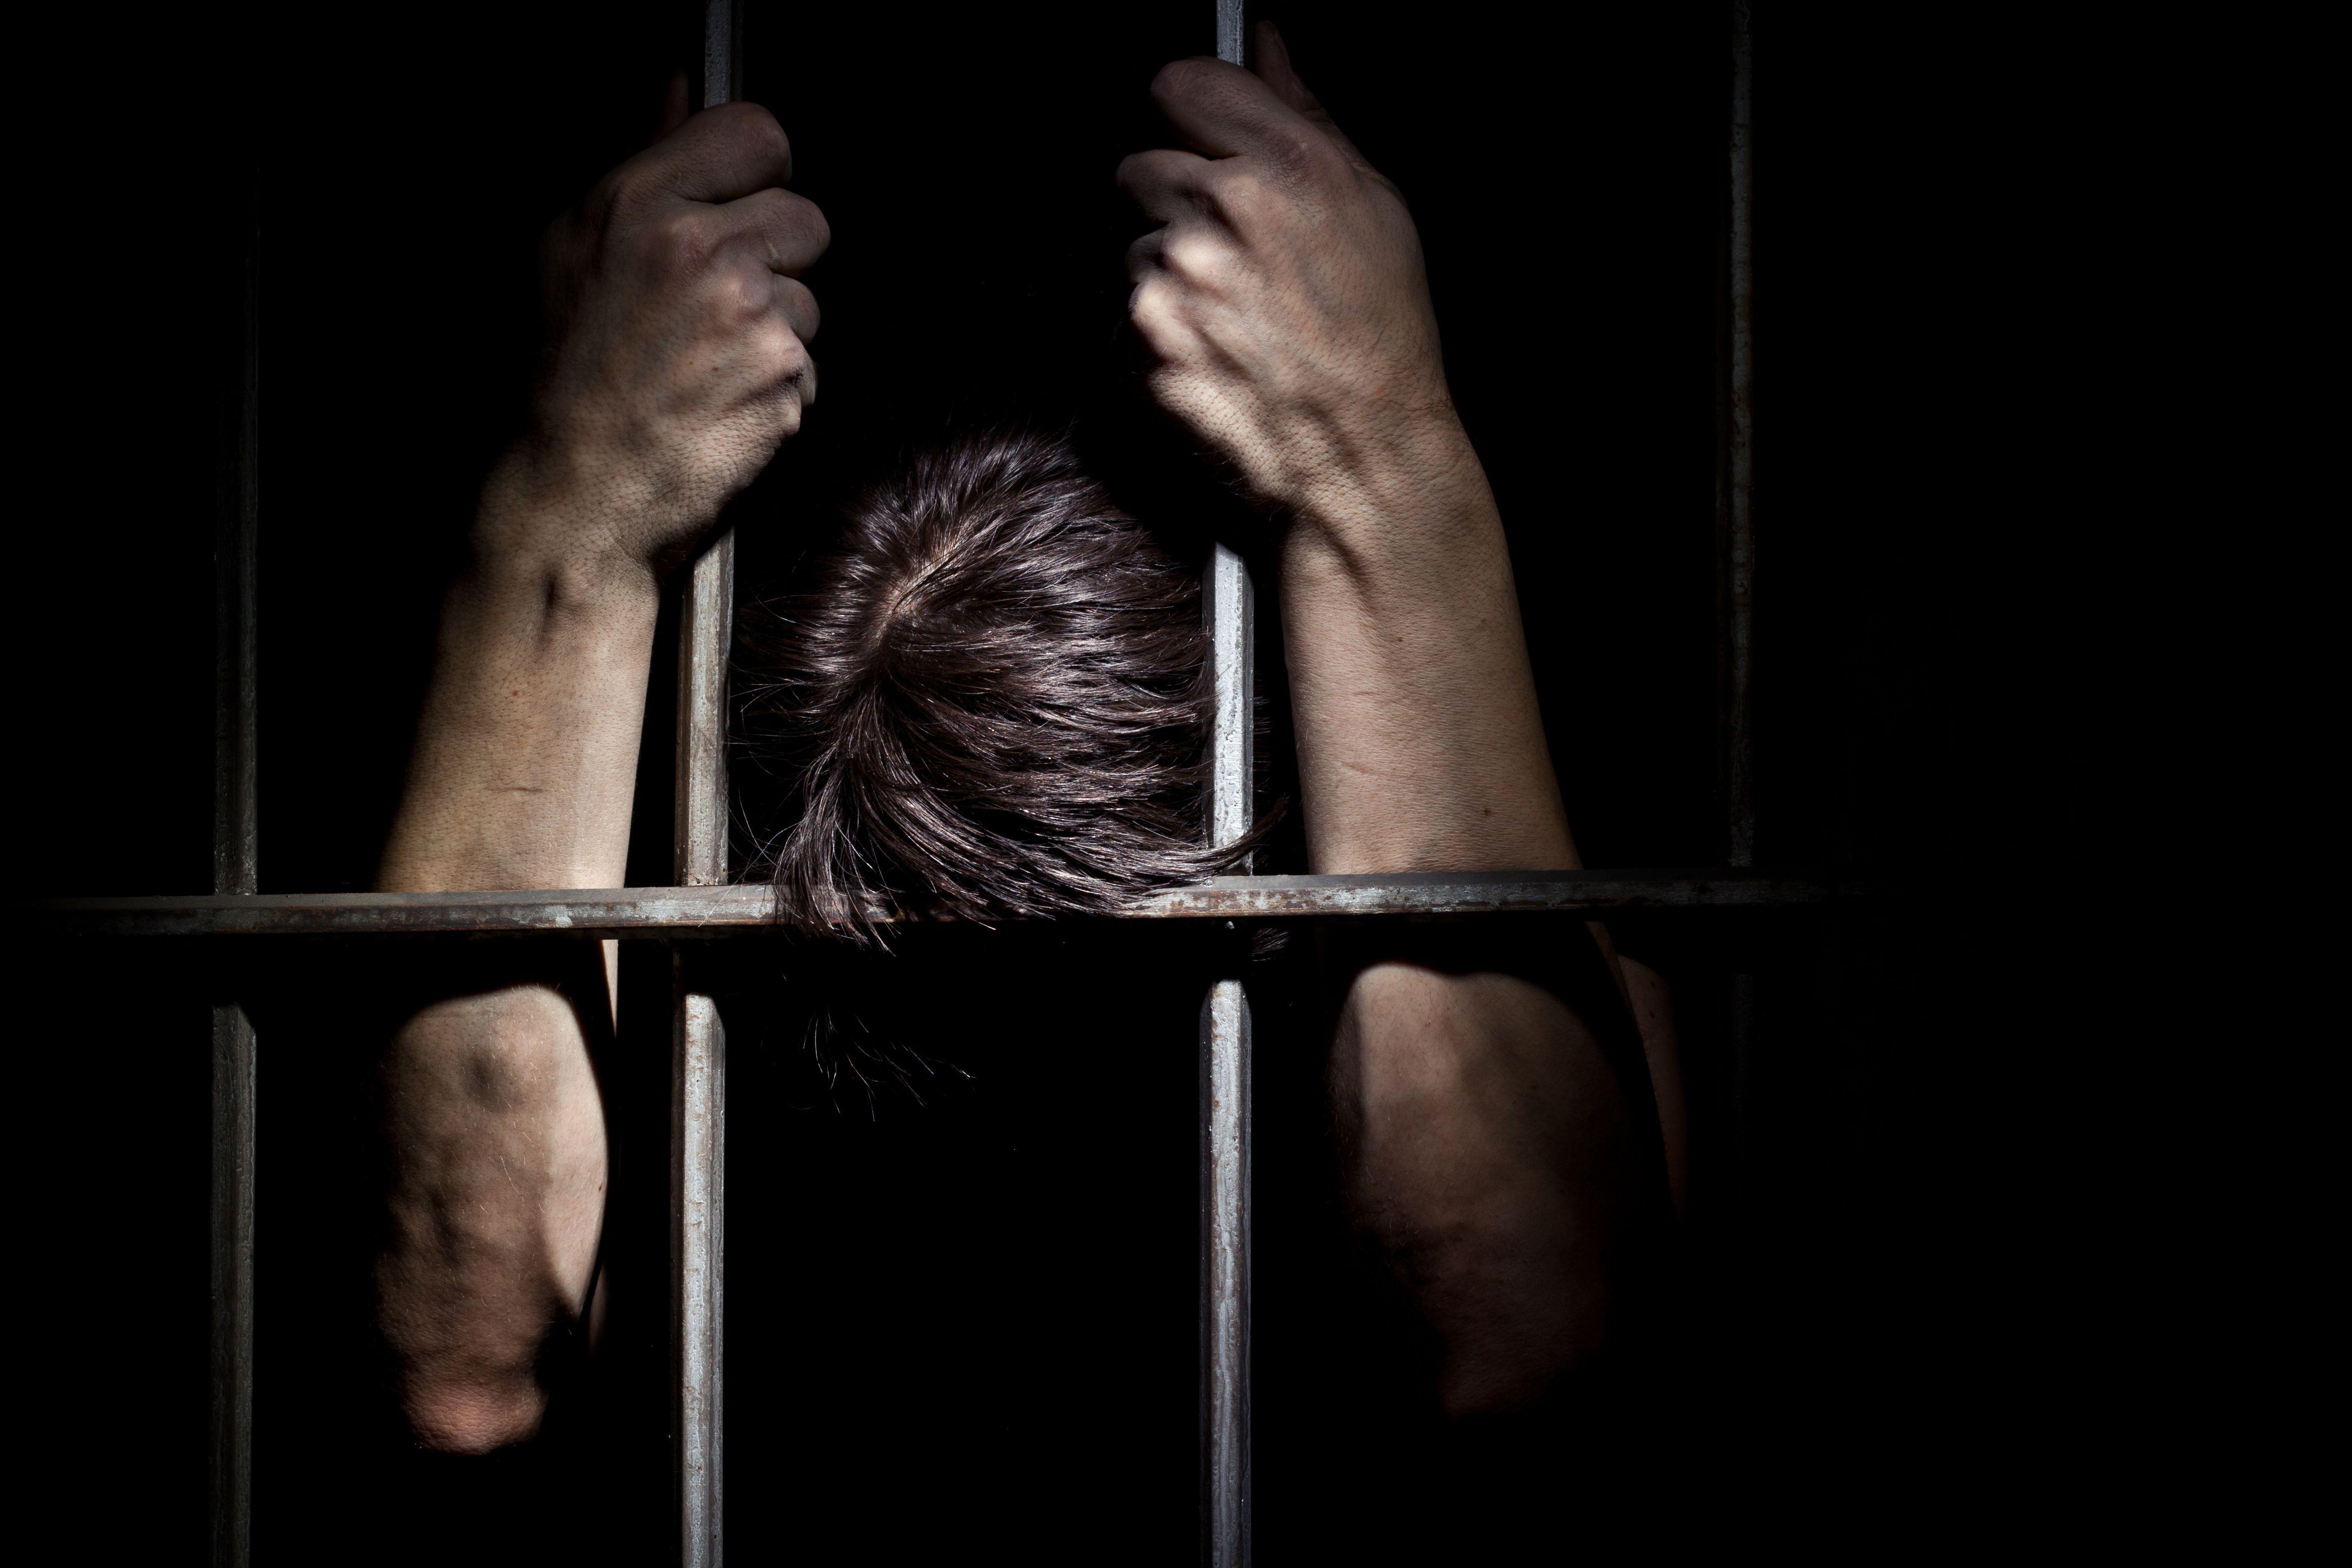 jail-pic